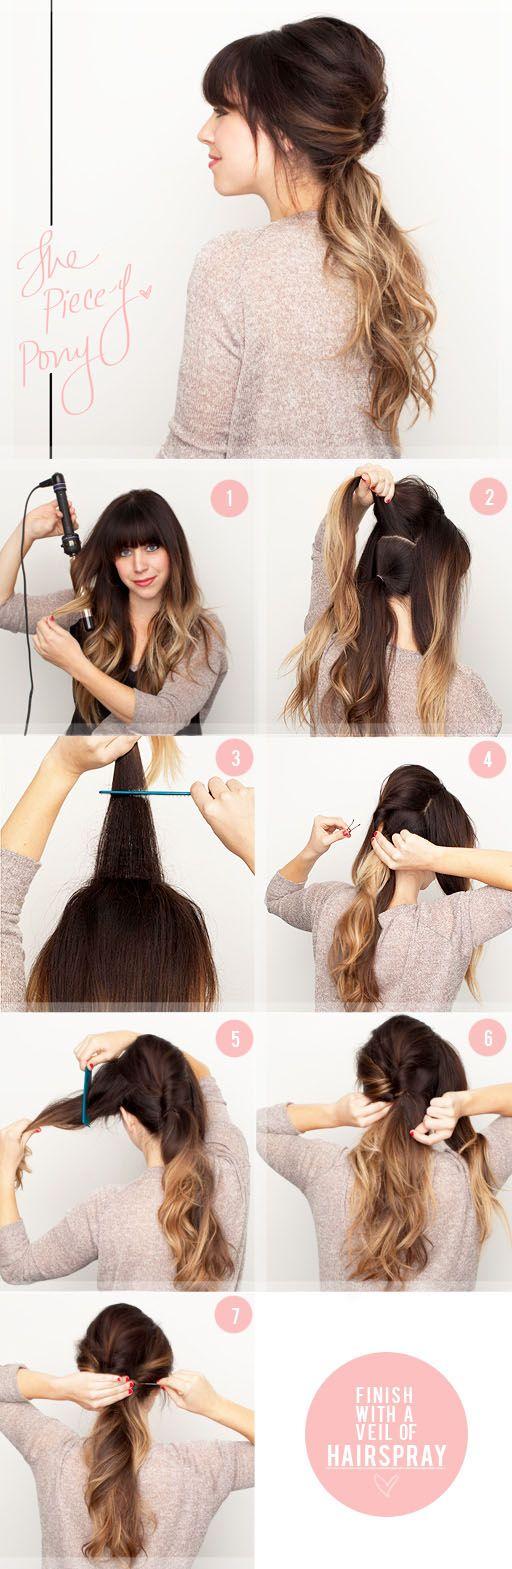 Hair holiday tutorials pinterest fotos